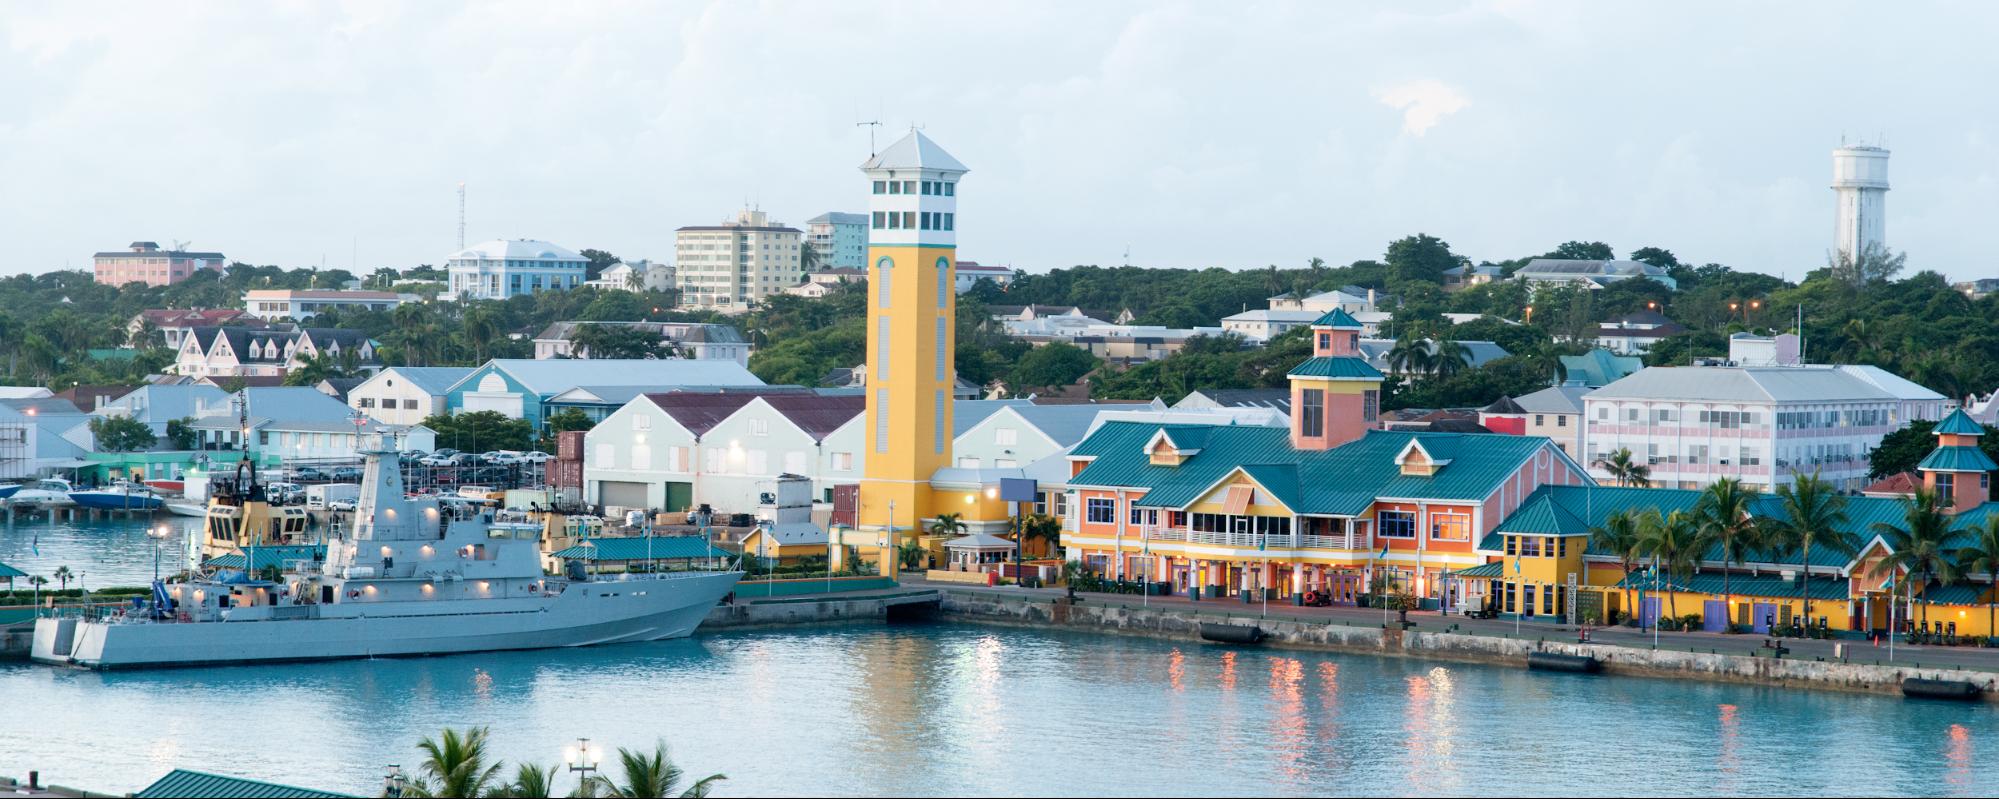 Downtown Nassau